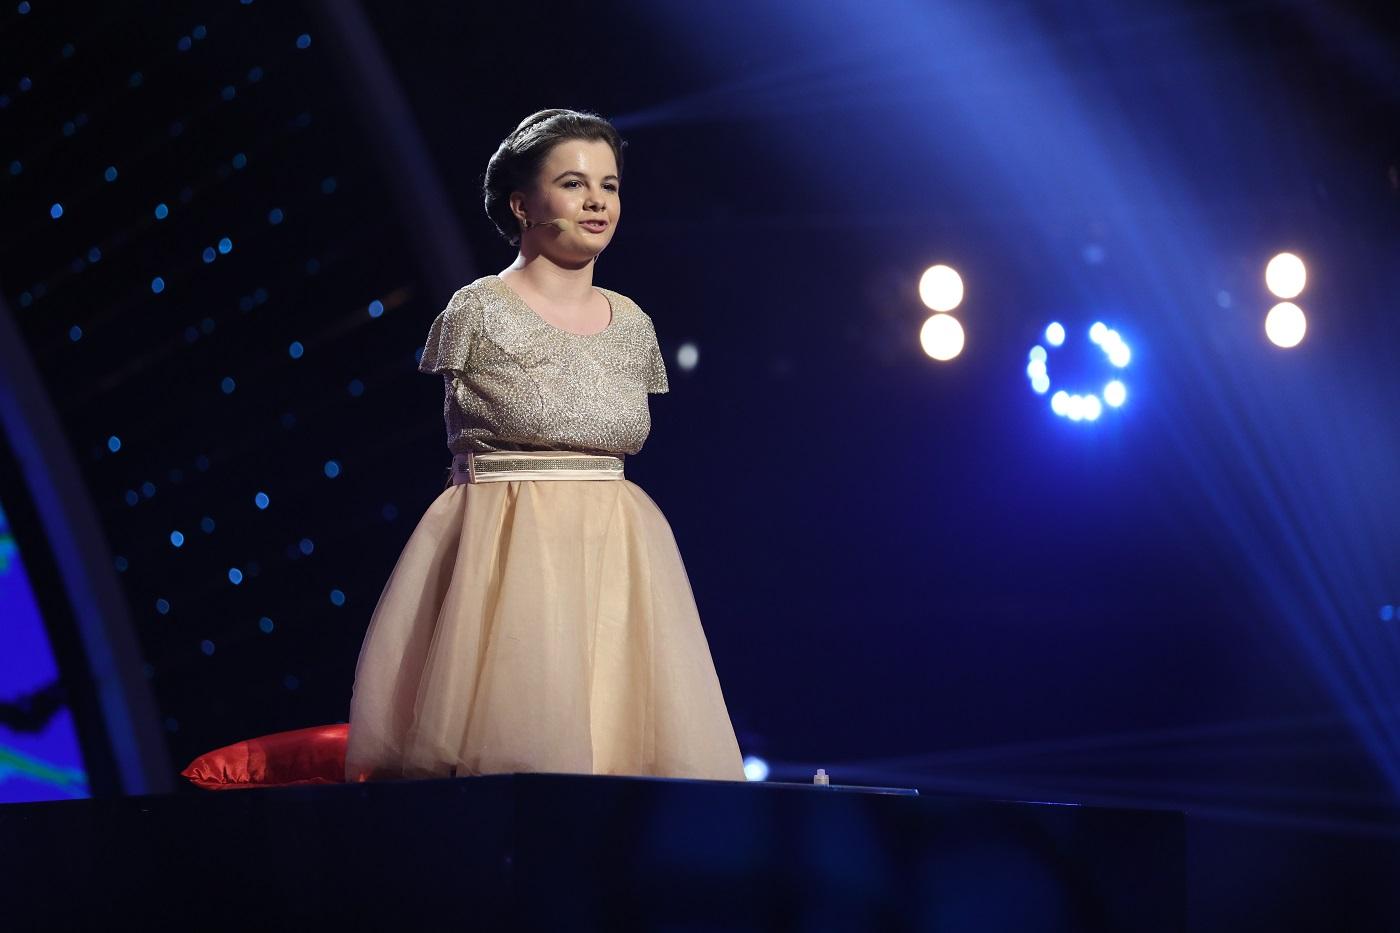 Lorelai Mosnegutu, tanara fara maini care canta la pian, a castigat